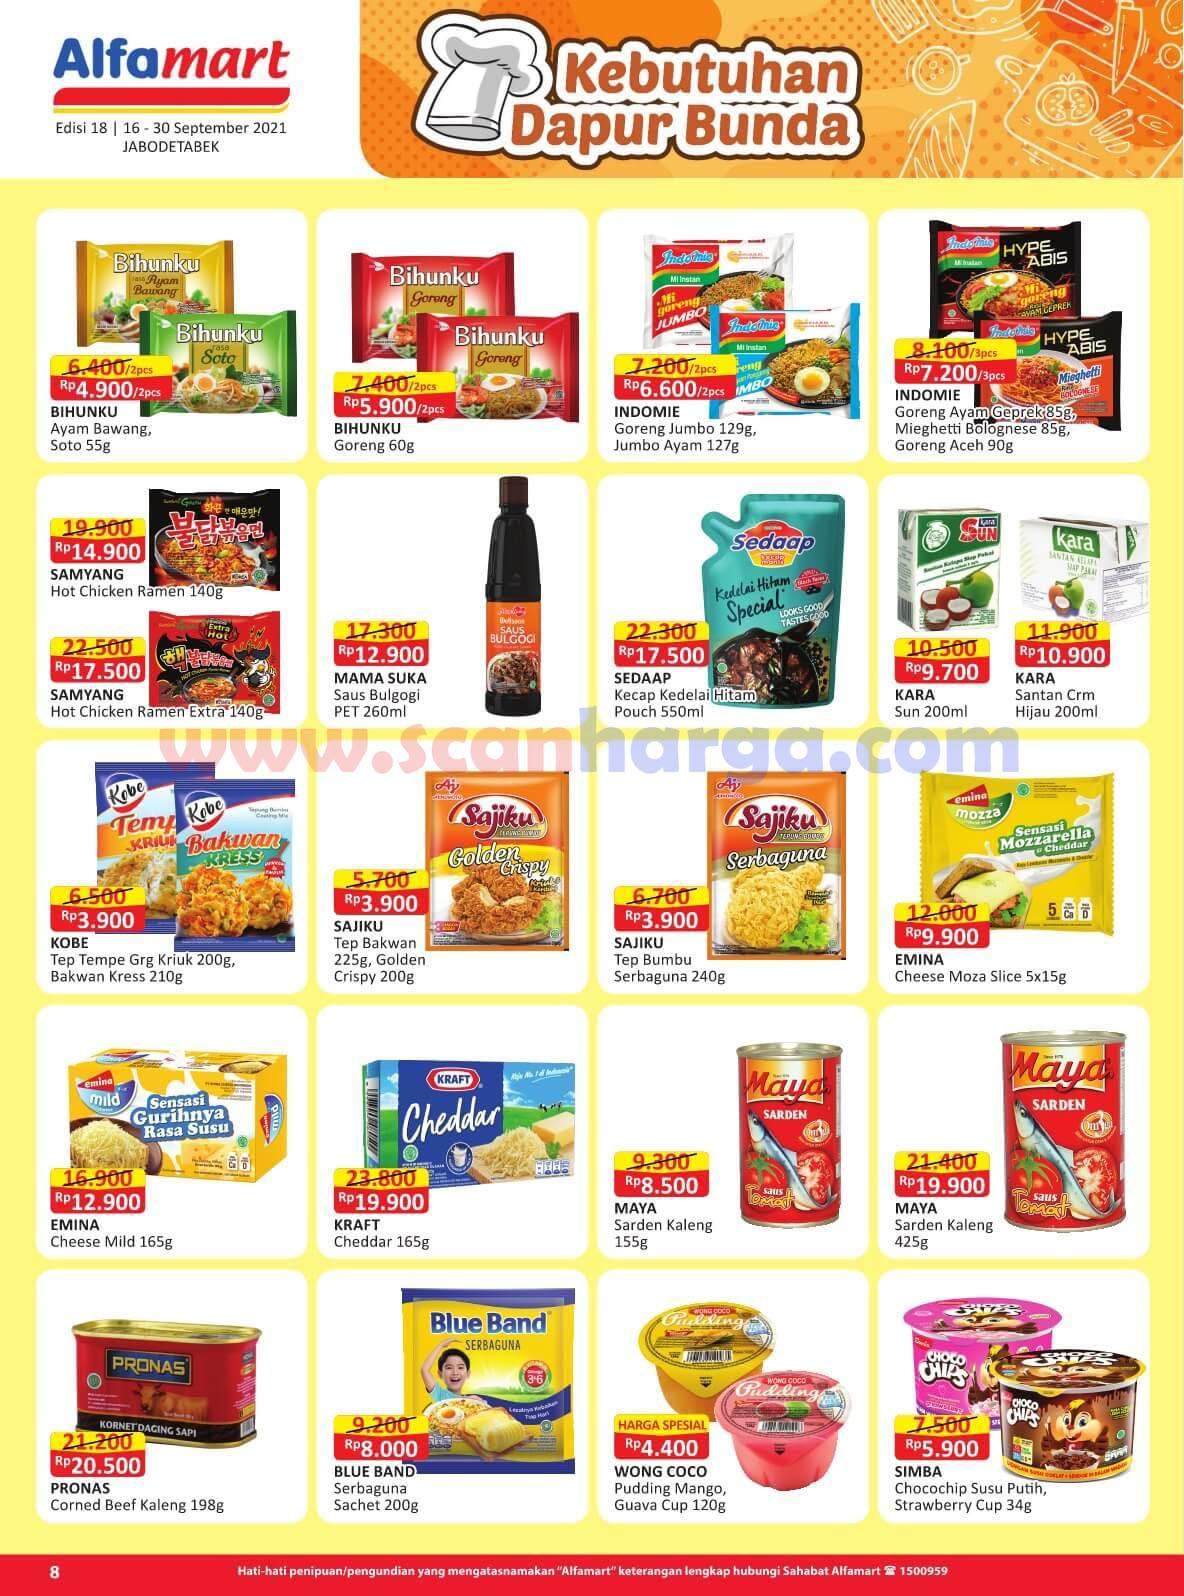 Katalog Promo Alfamart 16 - 30 September 2021 8